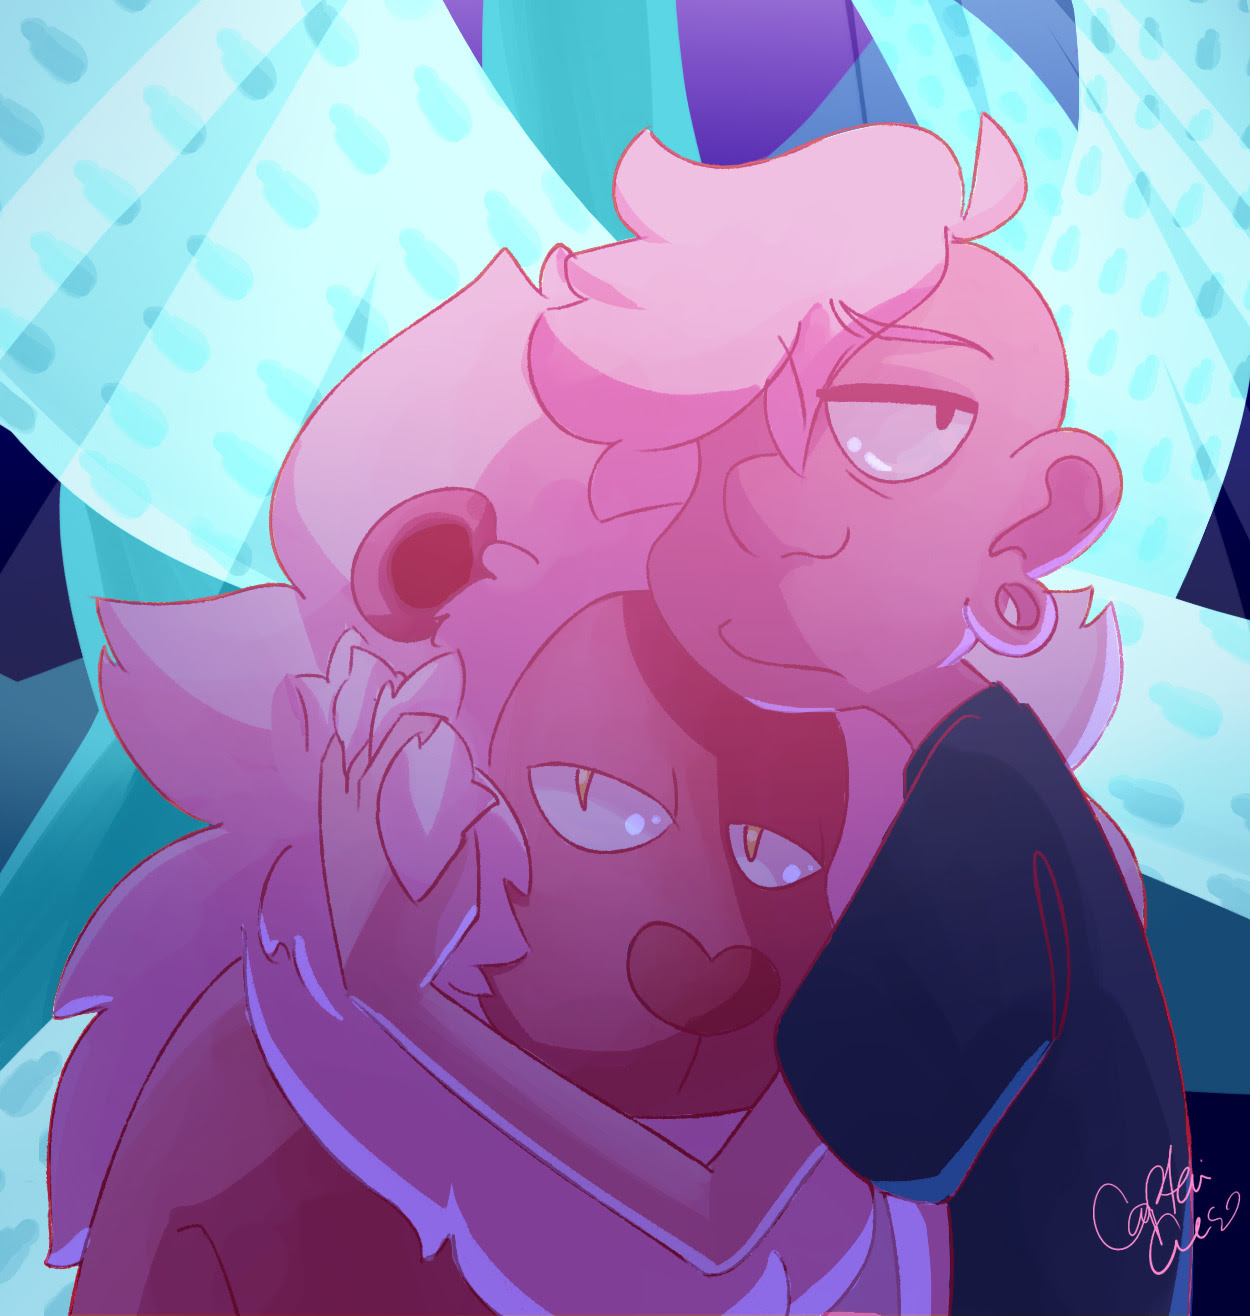 the pink boizz